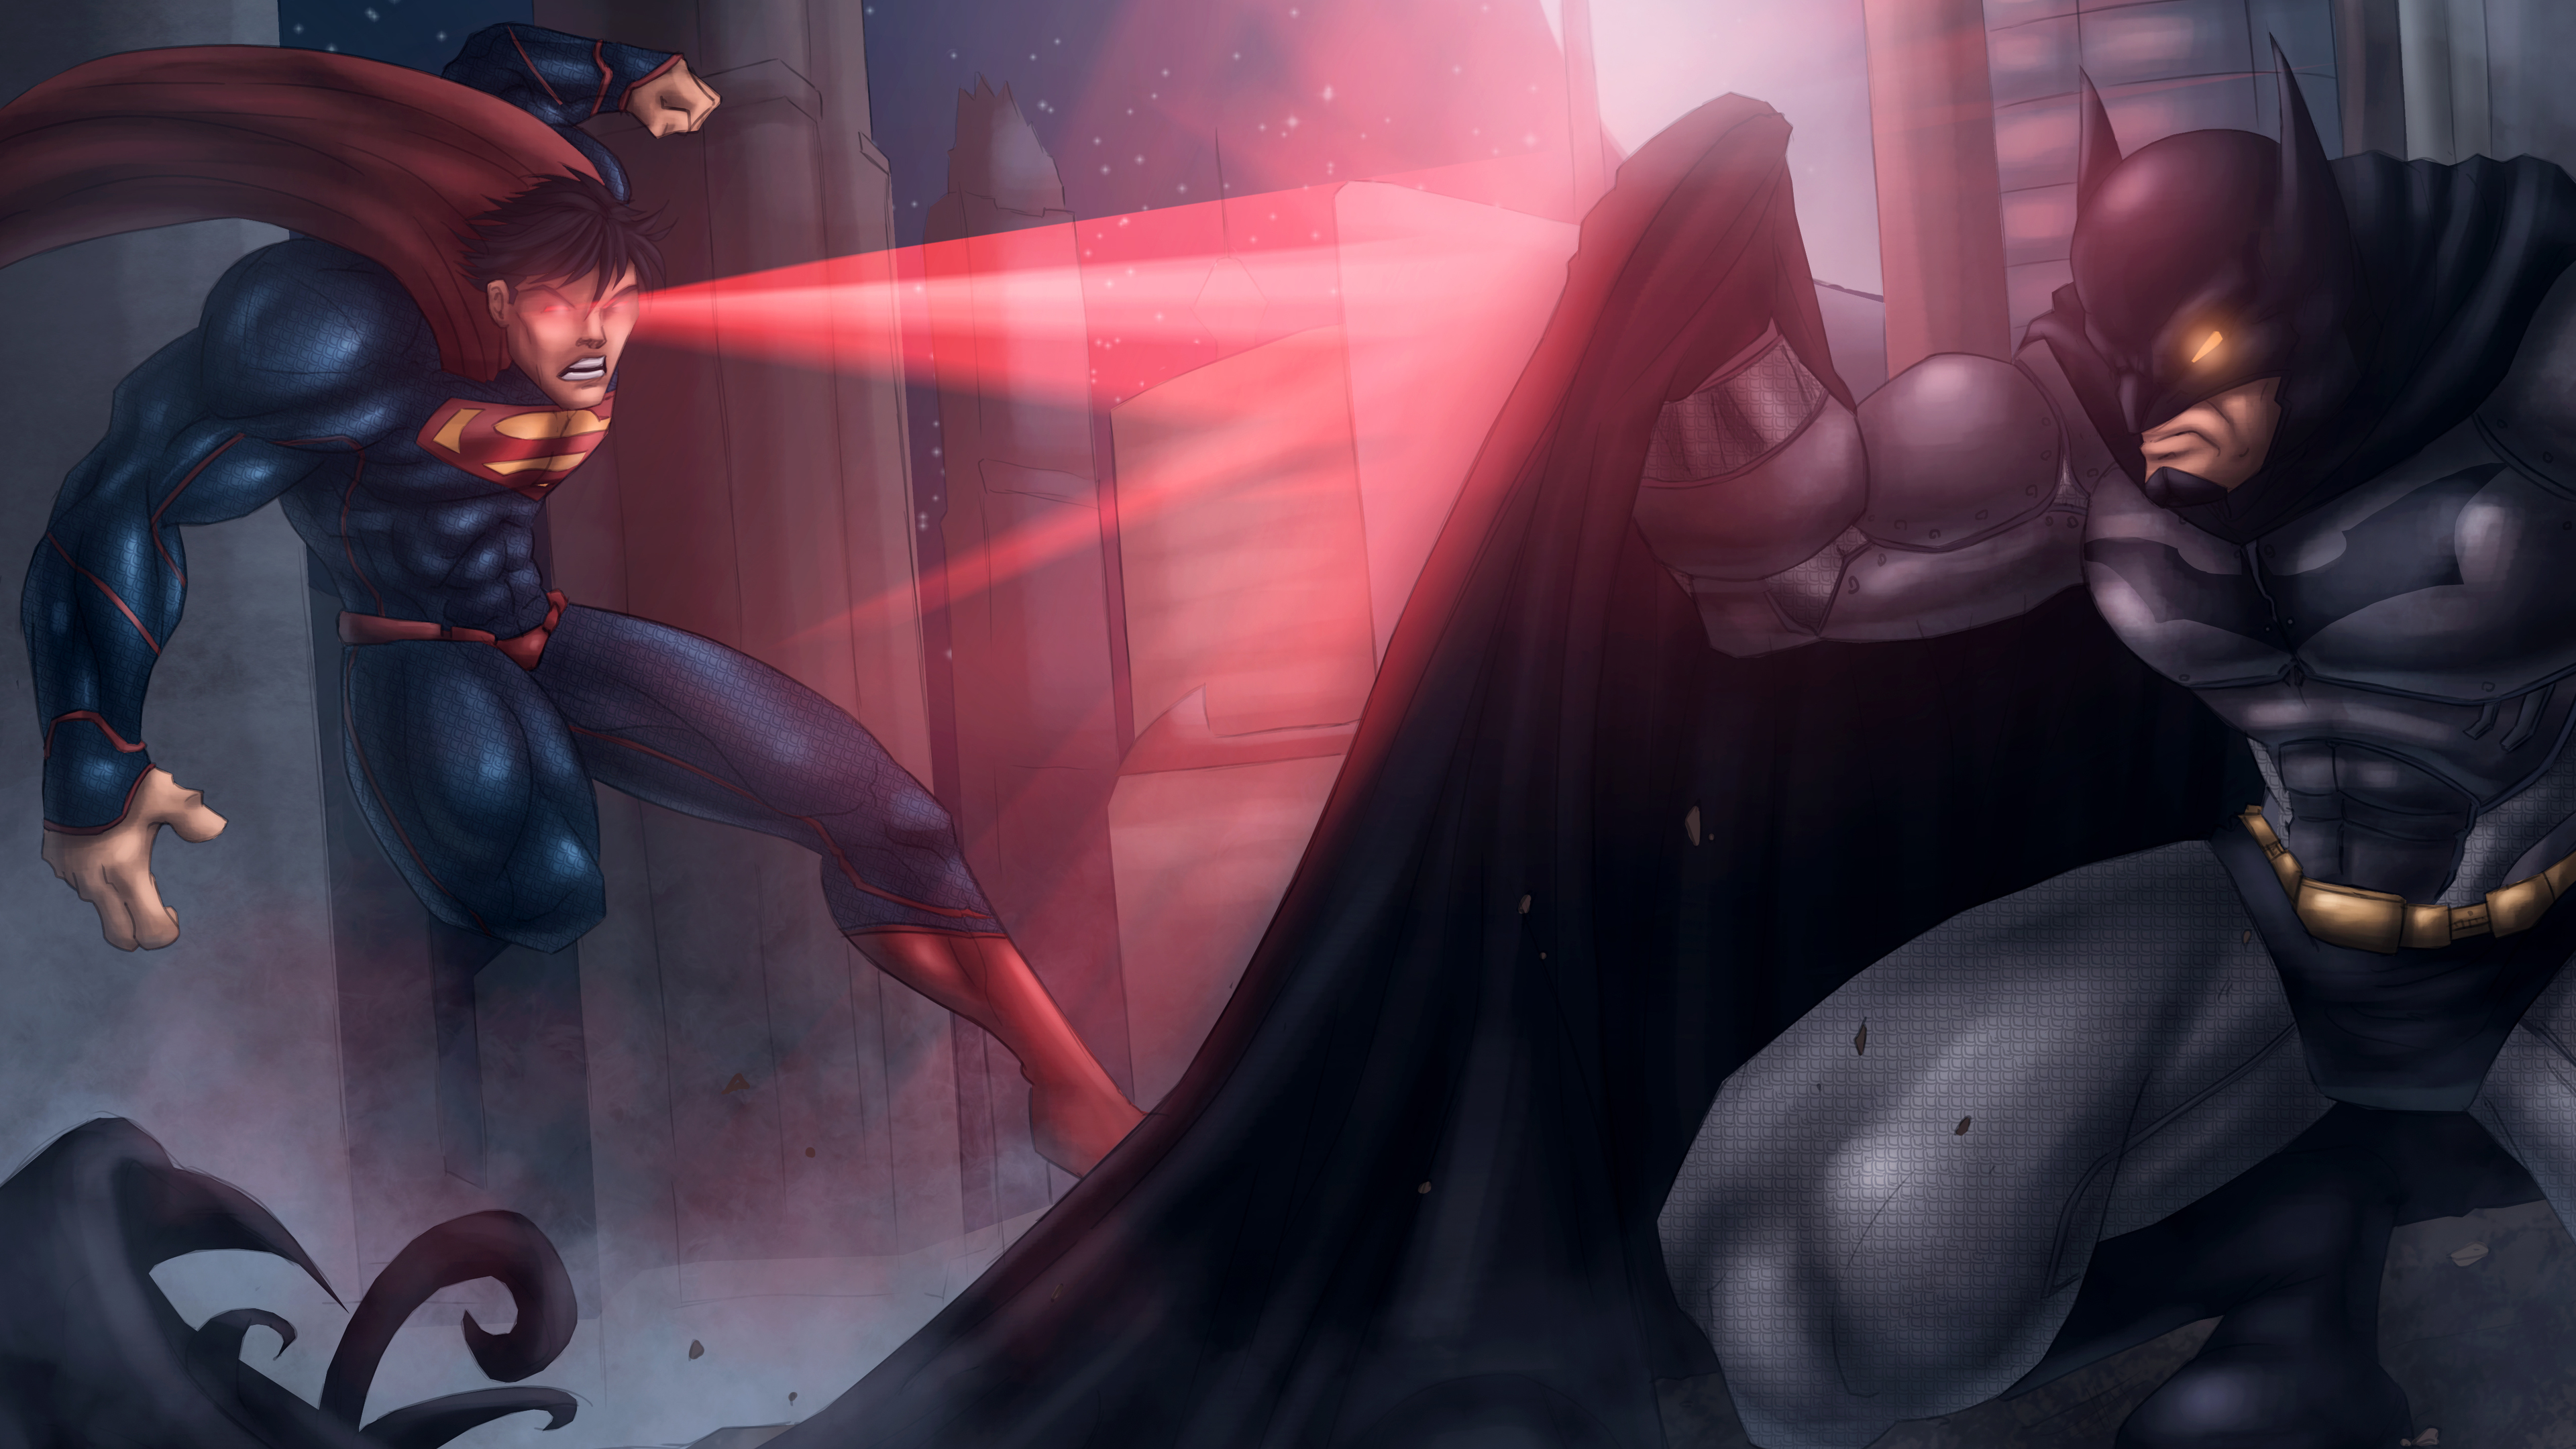 Wallpaper 4k Batman Vs Superman Artwork 5k 4k Wallpapers 5k